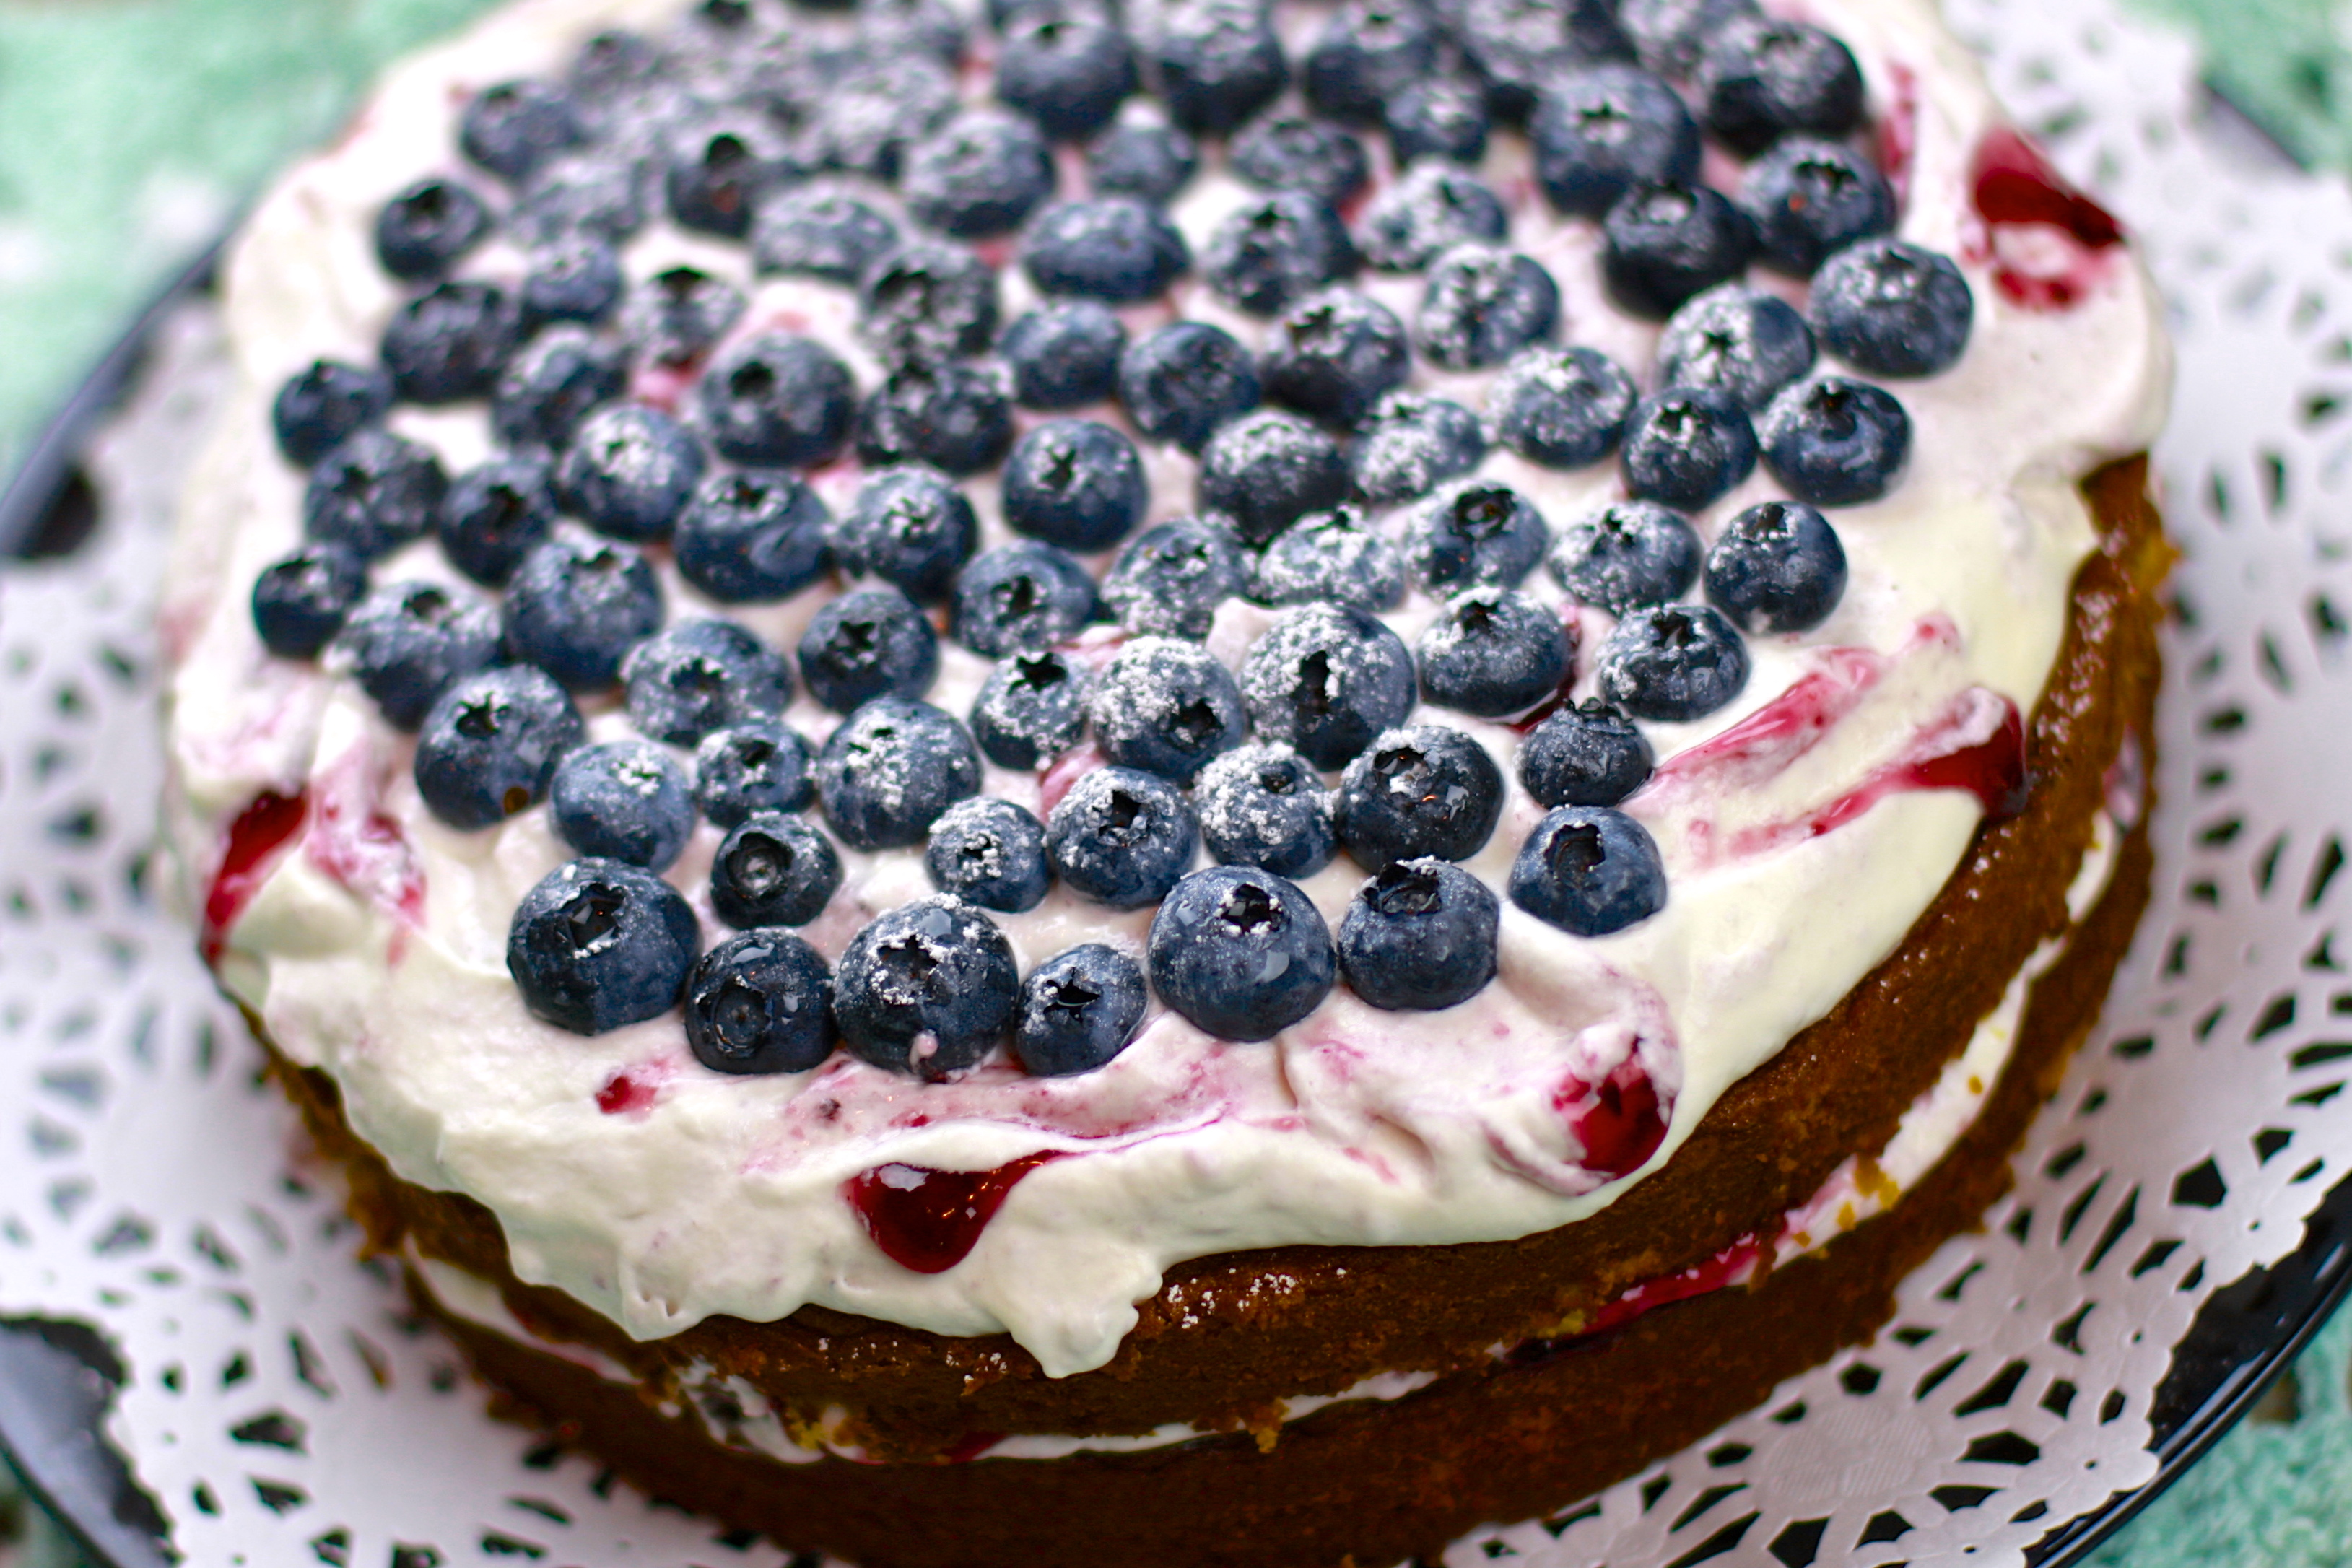 Blueberry Cake – Enjoy Berries While It's Still in Season!